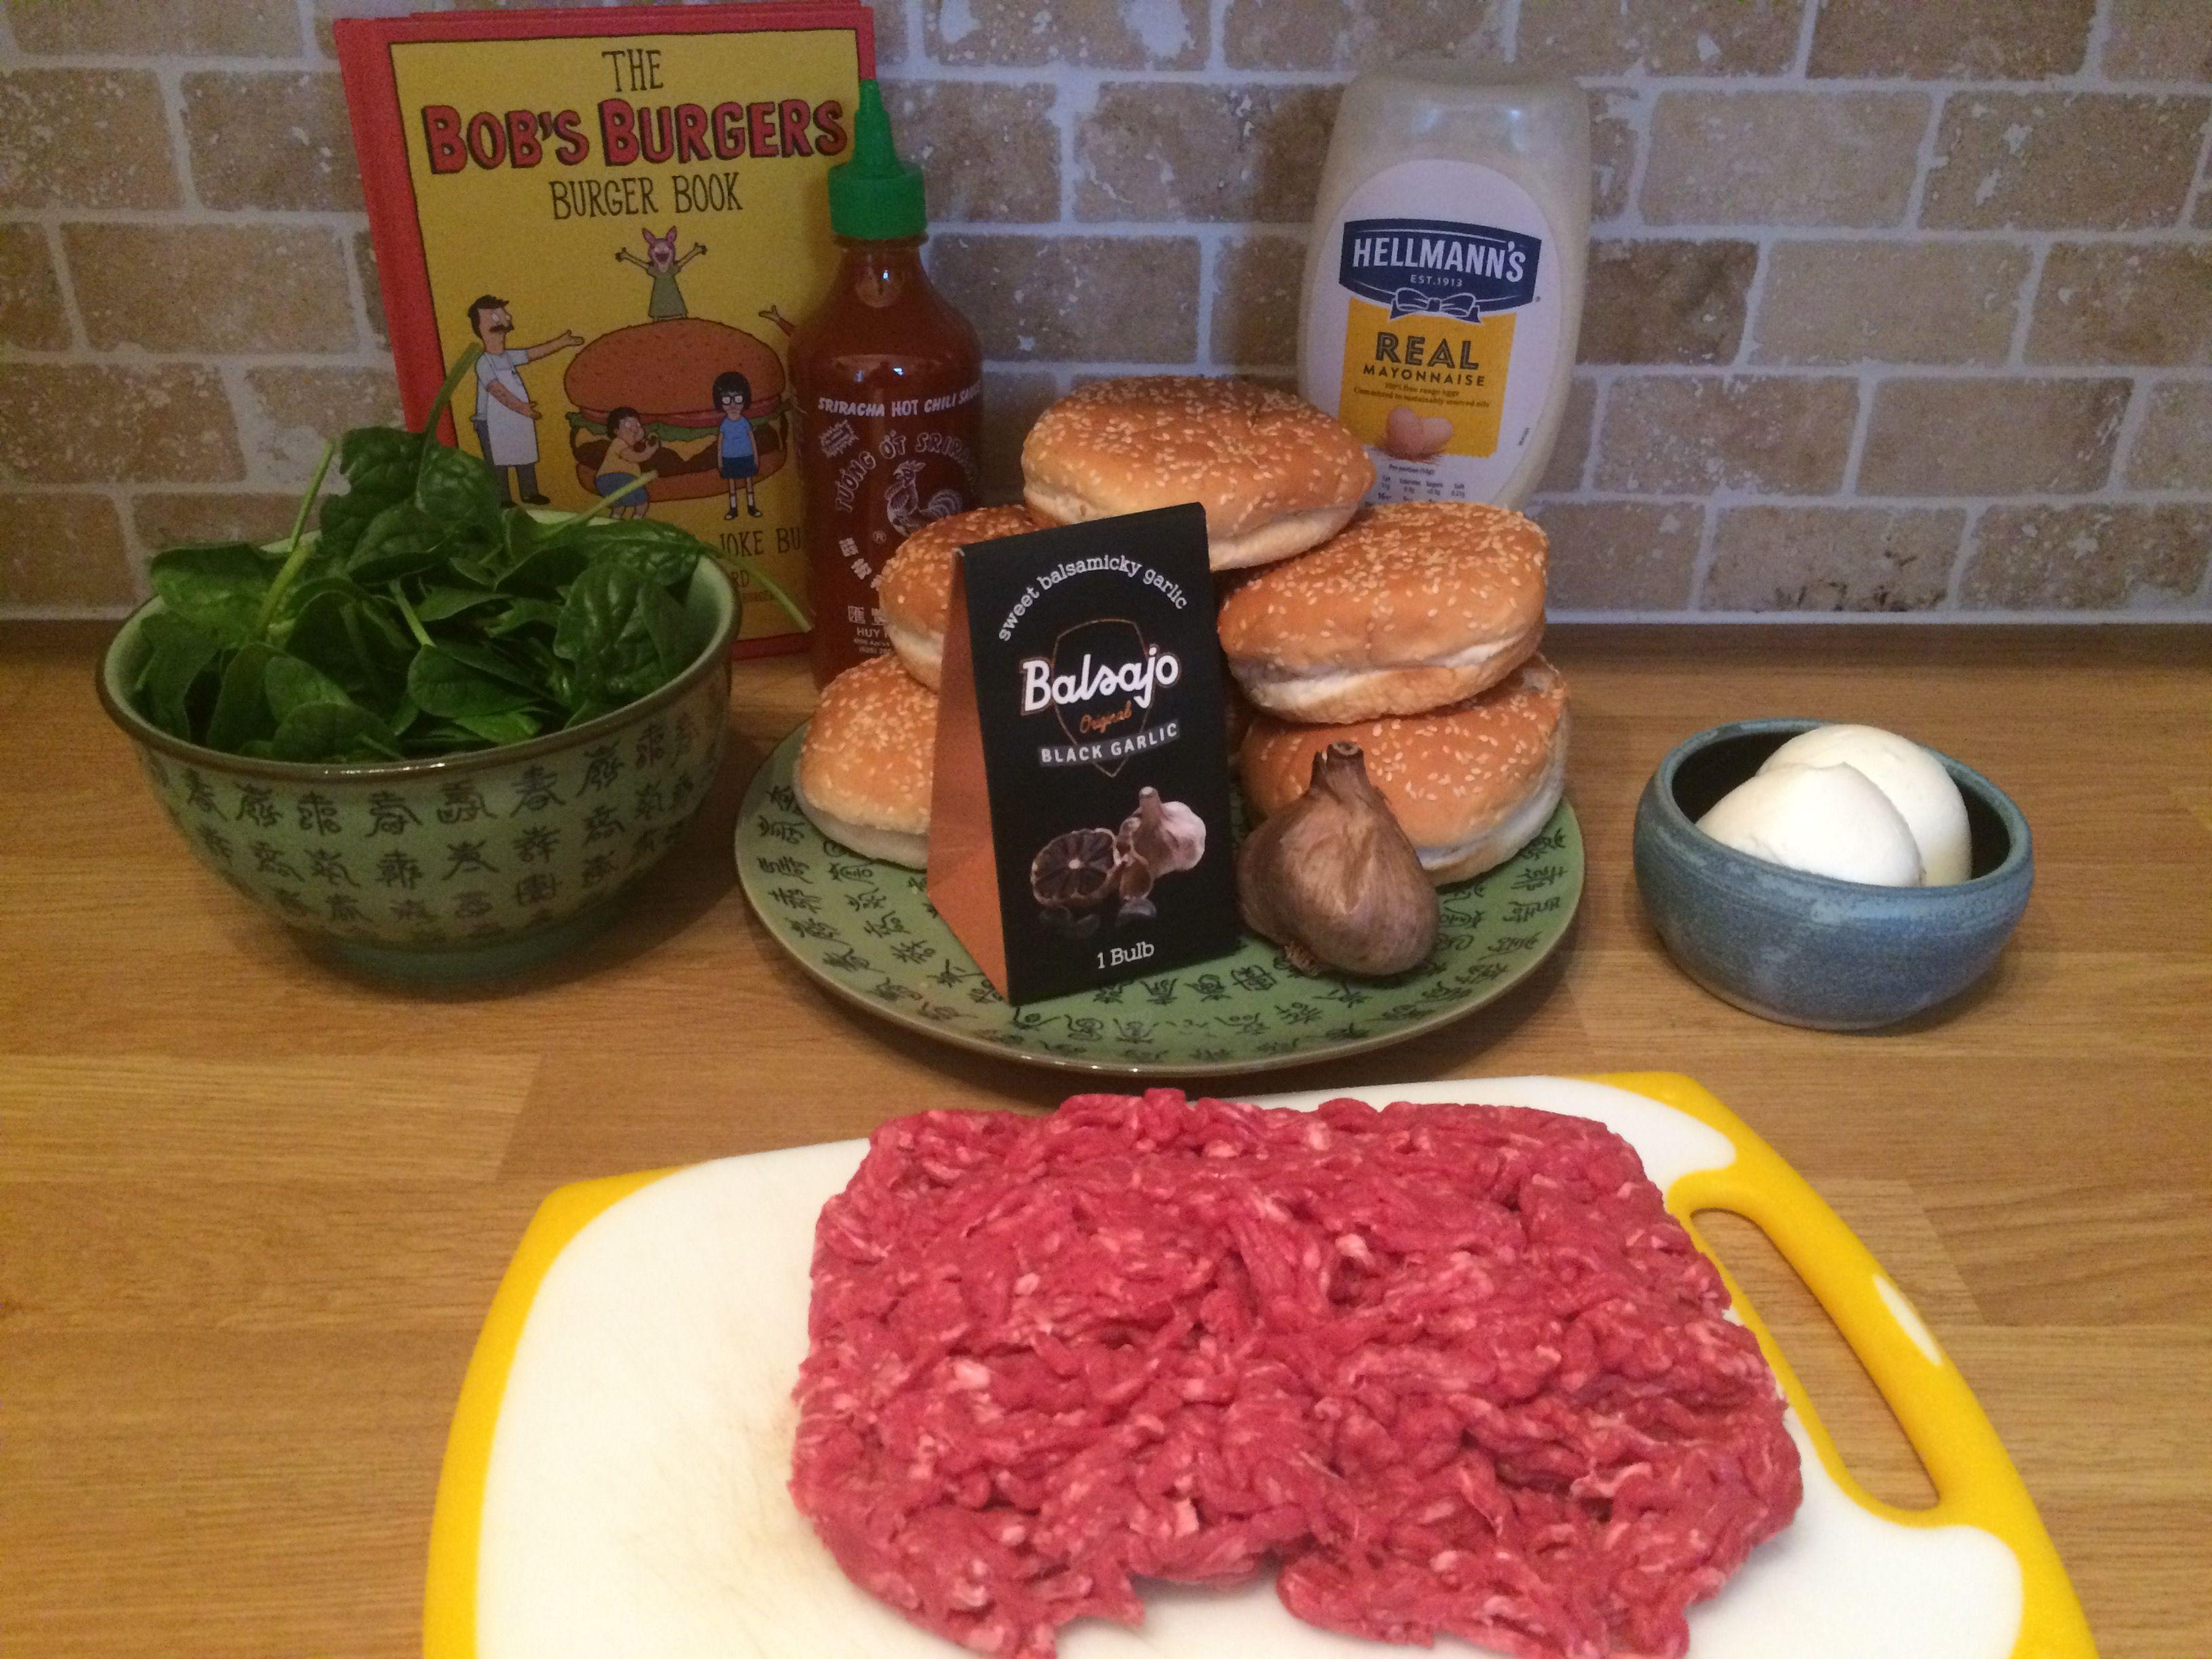 Cool bobs burgers recipe book week 9 bet it all on black garlic cool bobs burgers recipe book week 9 bet it all on black forumfinder Images